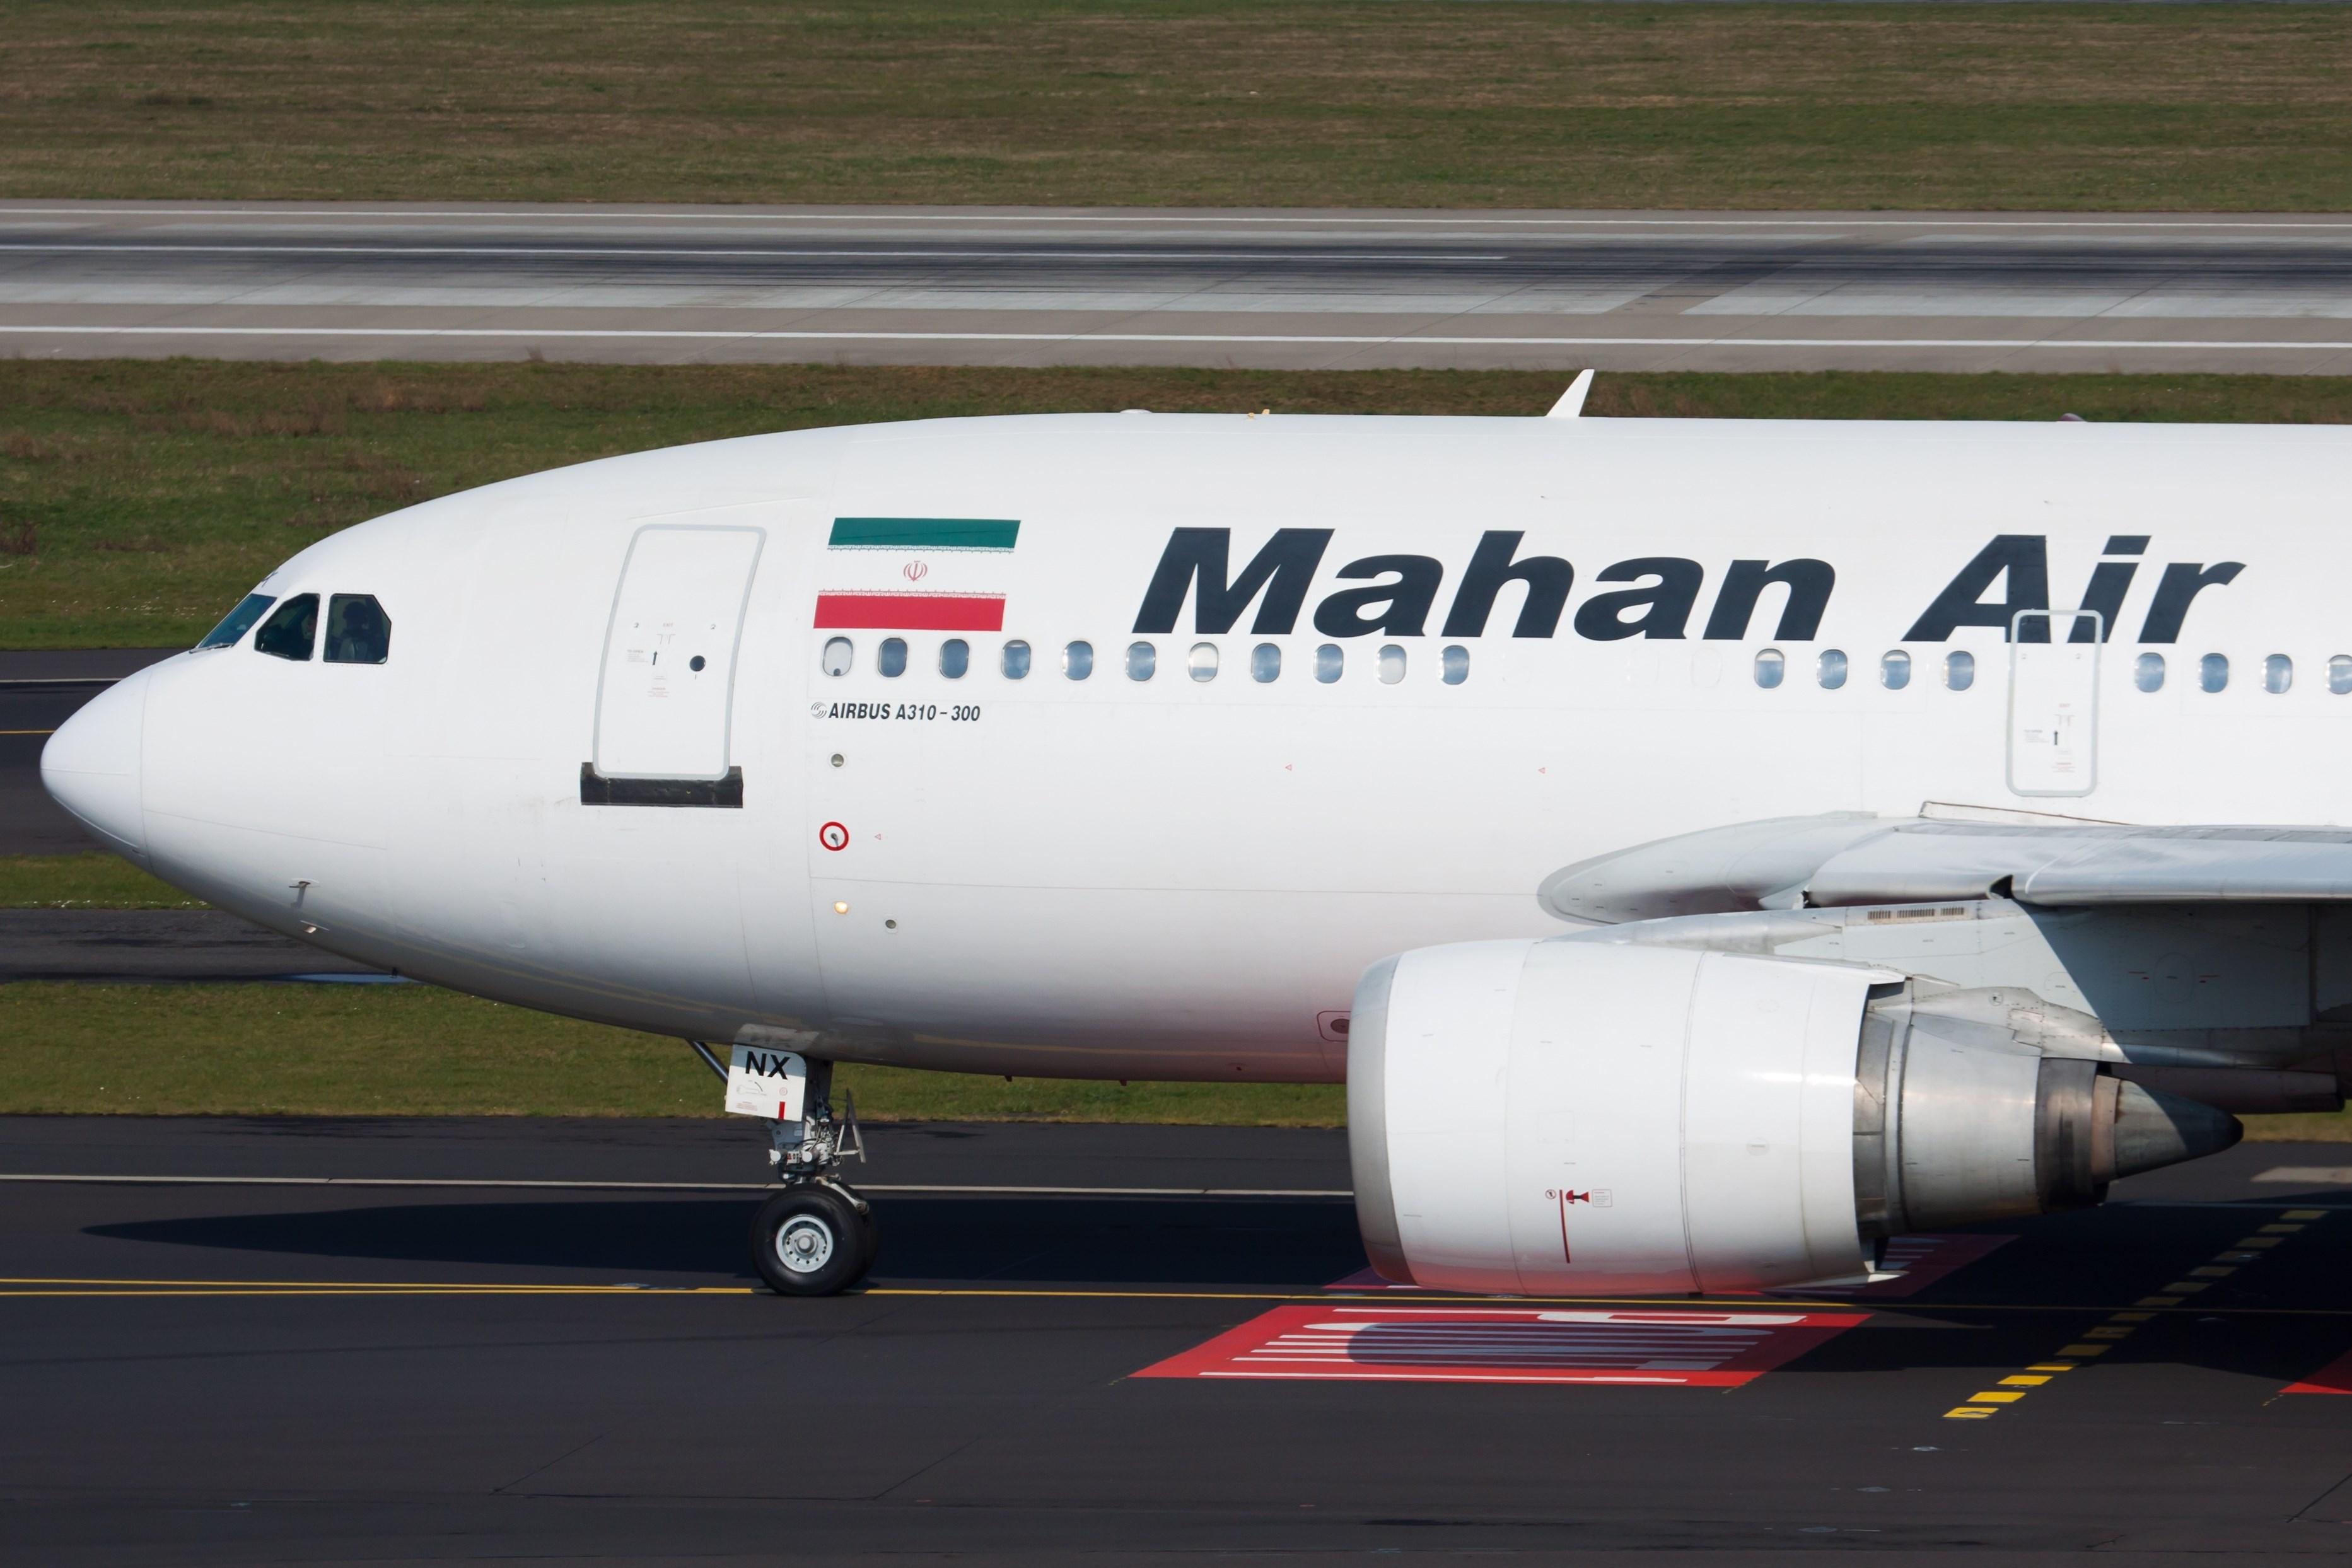 A Mahan Air flight lands in Kabul carrying 19 passengers